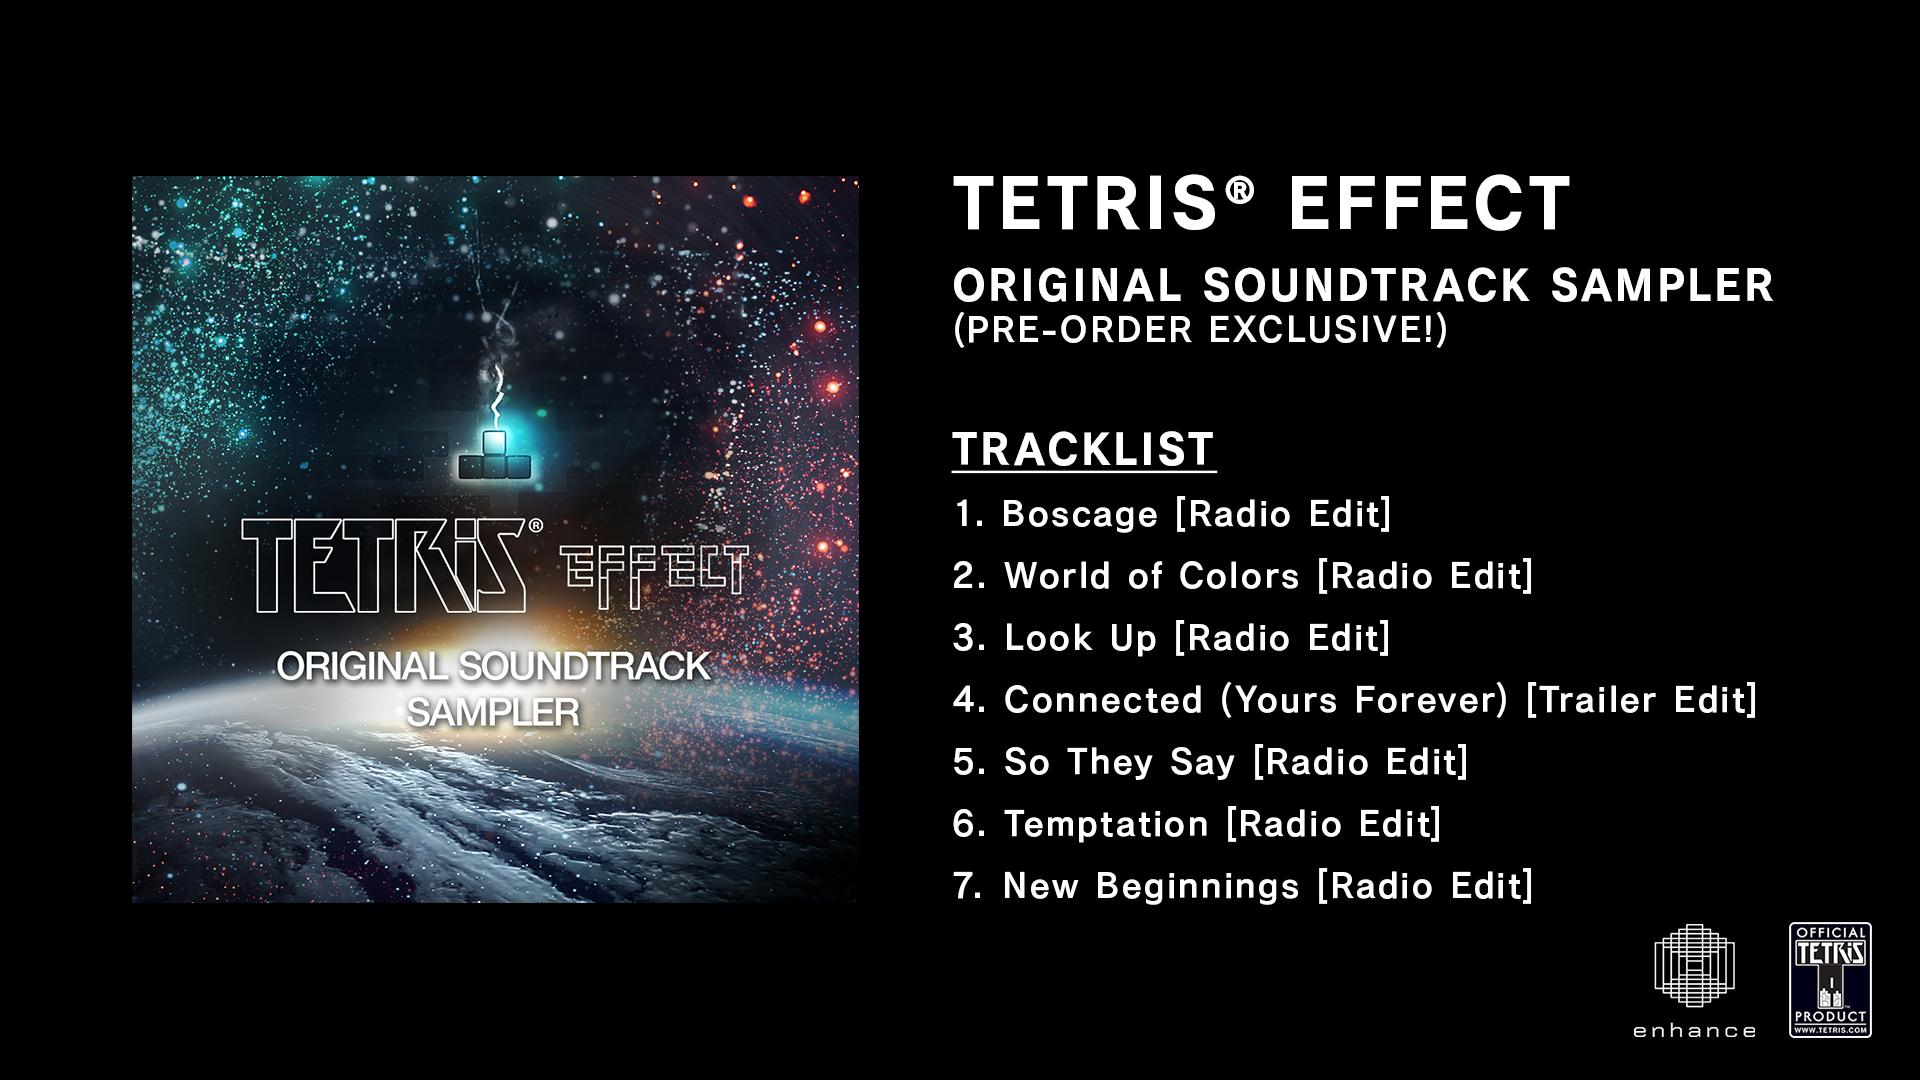 tetriseffect_ost_tracklist_black_bkg